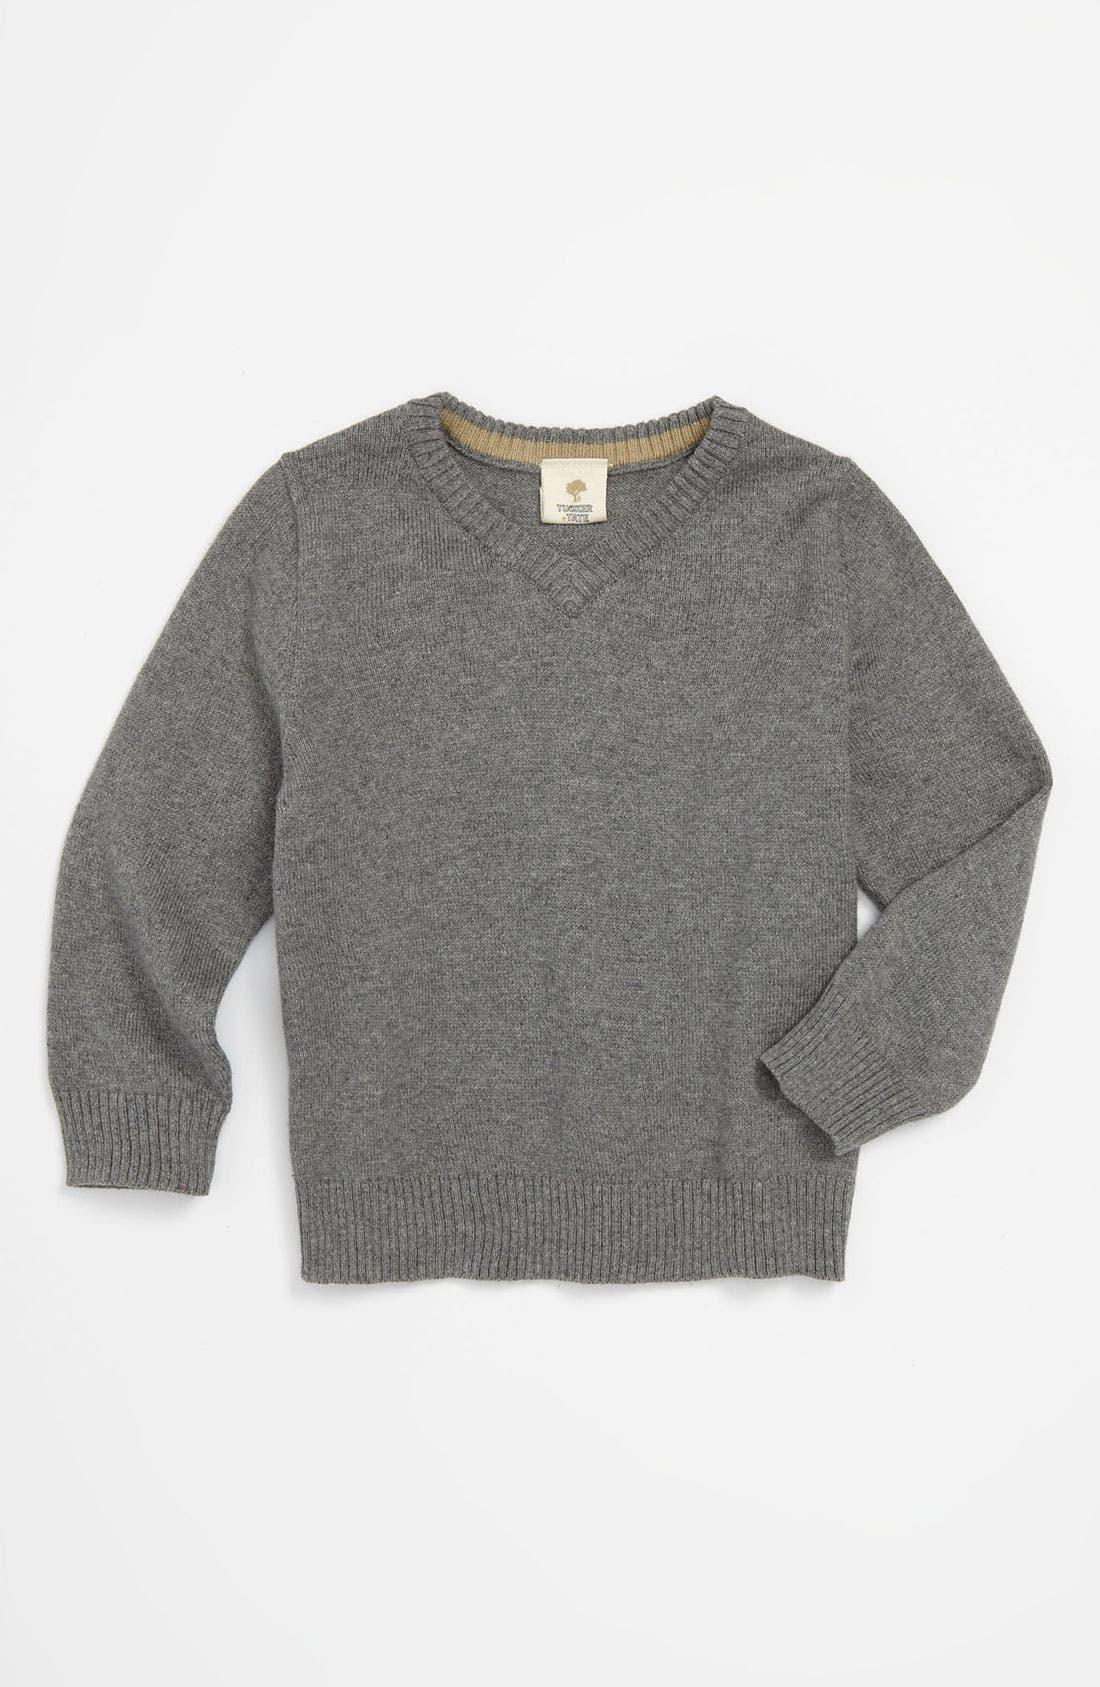 Main Image - Tucker + Tate 'Atticus' Sweater (Toddler)